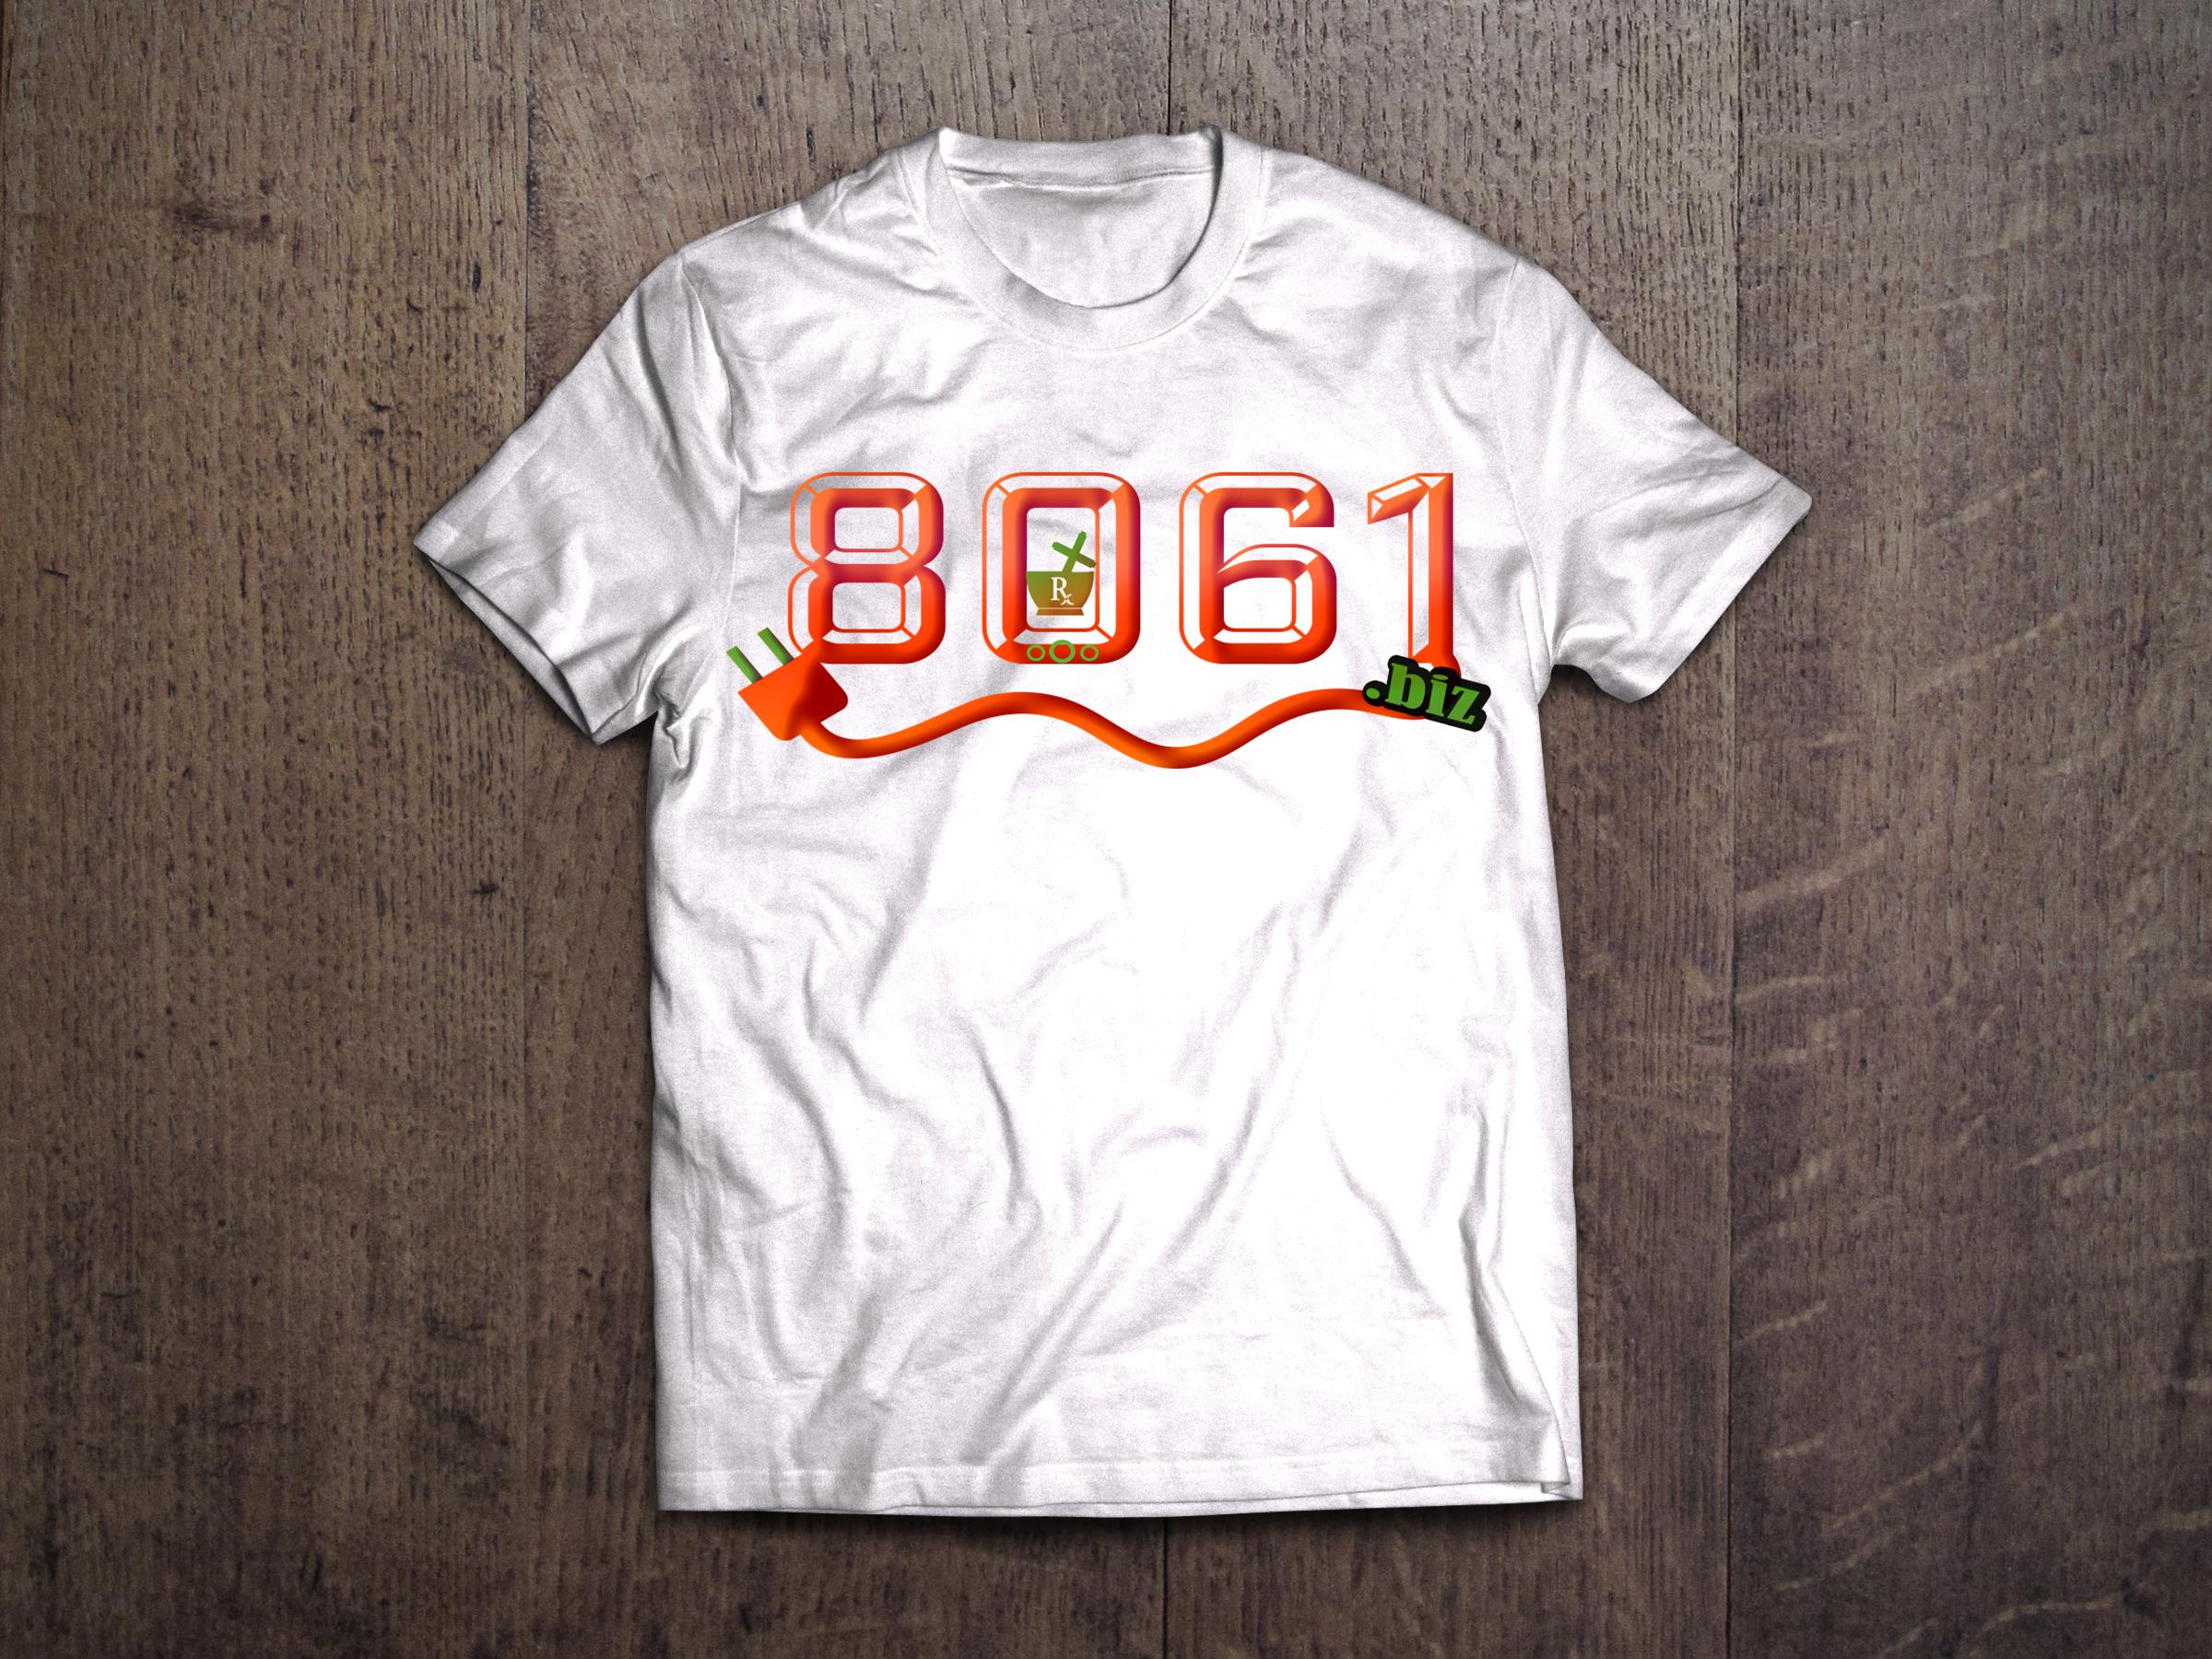 jayson tshirt1